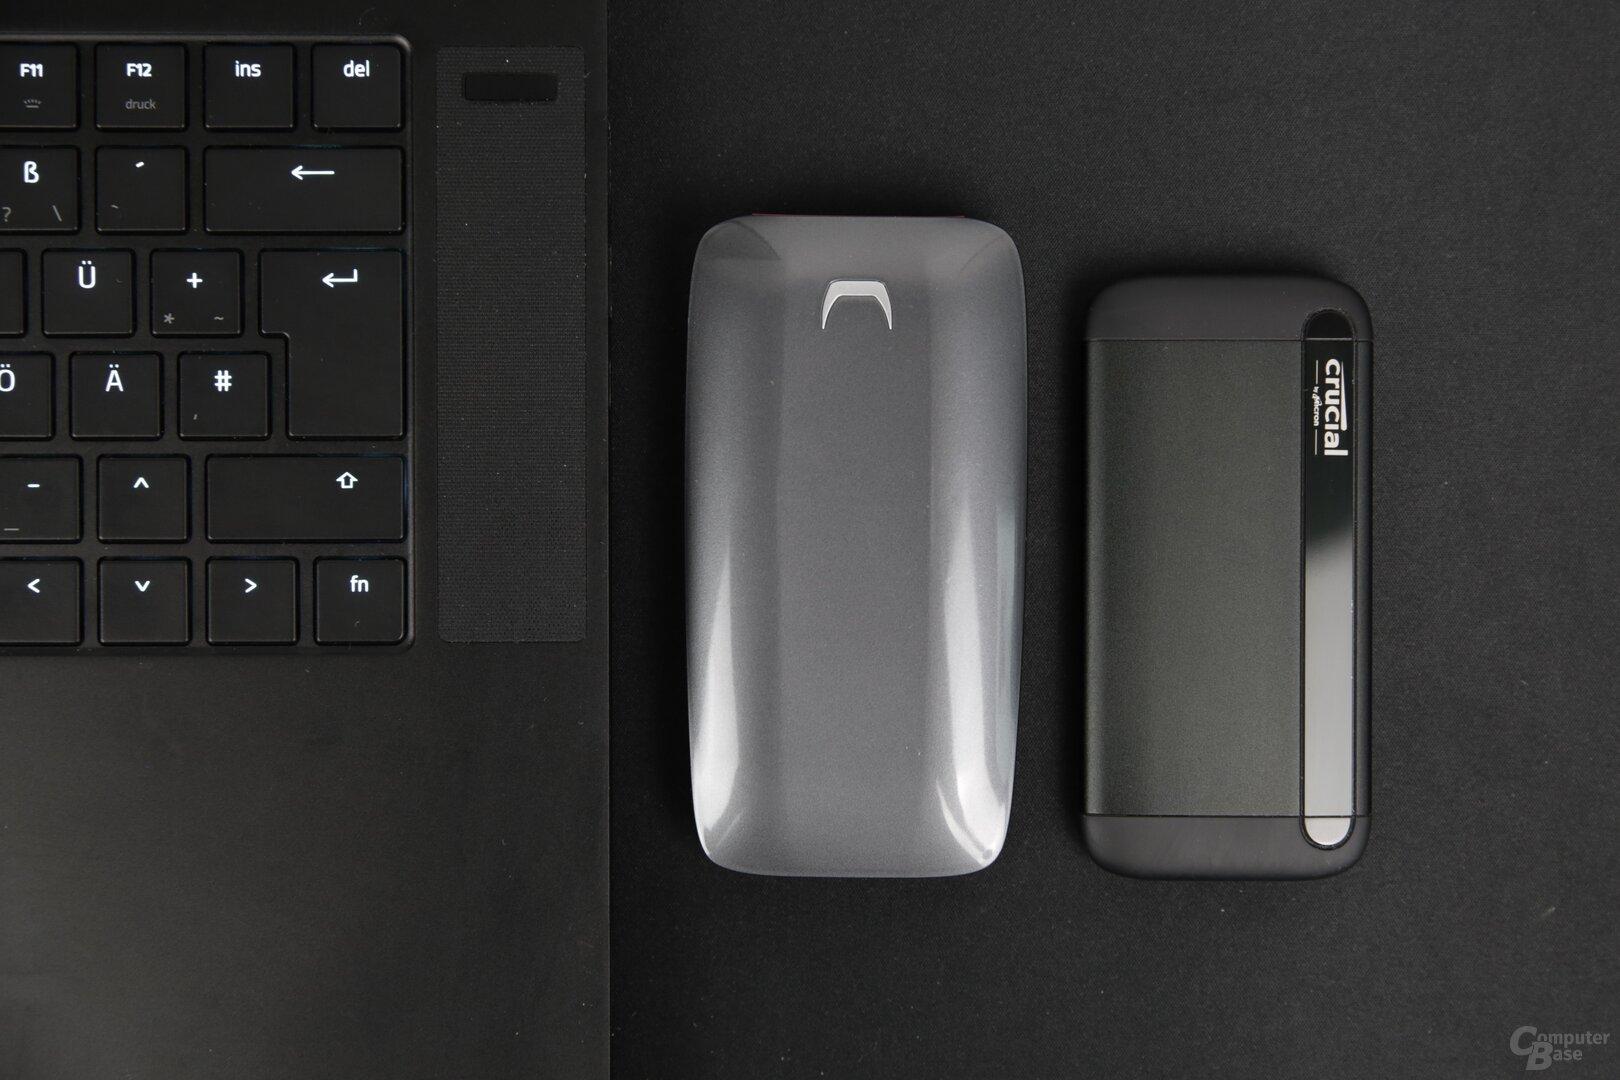 Externe SSDs: Samsung Portable X5 vs. Crucial X8 Portable